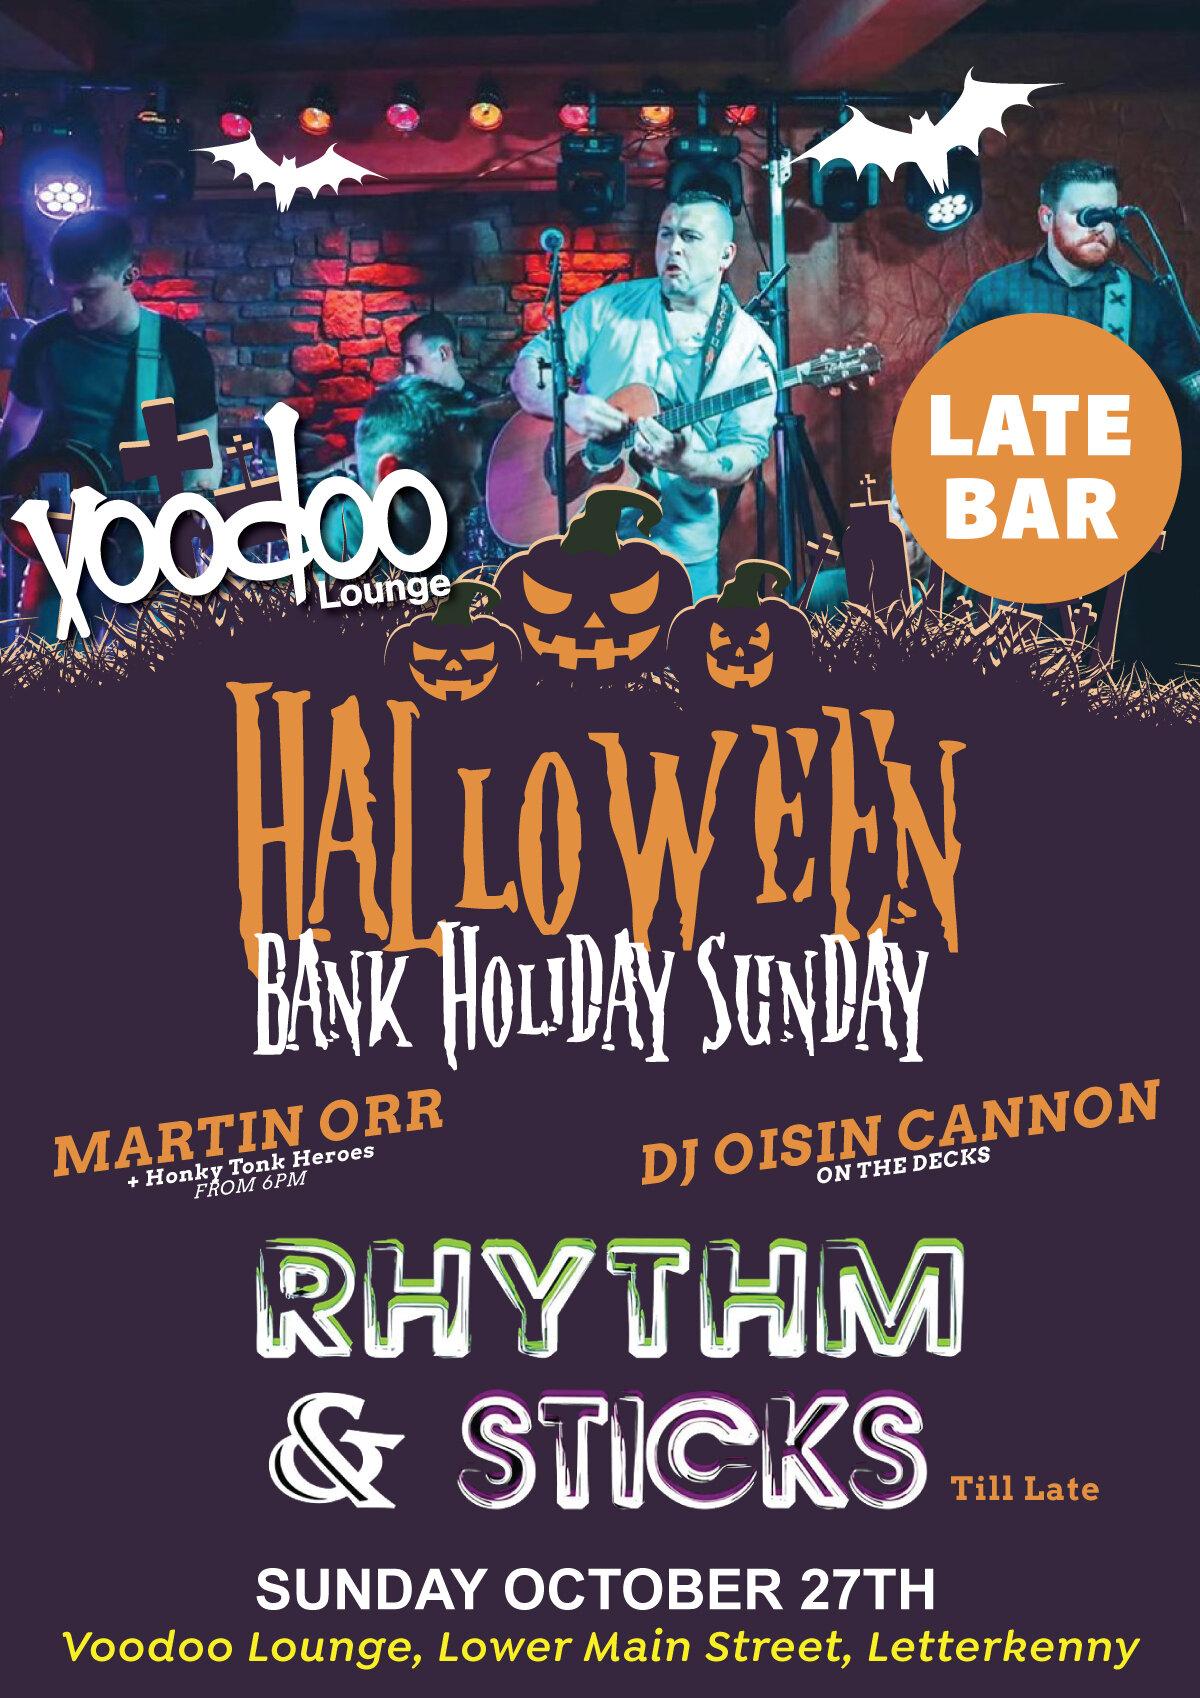 voodoo-venue-bank-holiday-sunday-rhythym-and-sticks-halloween-sun-oct-27-2019.jpg